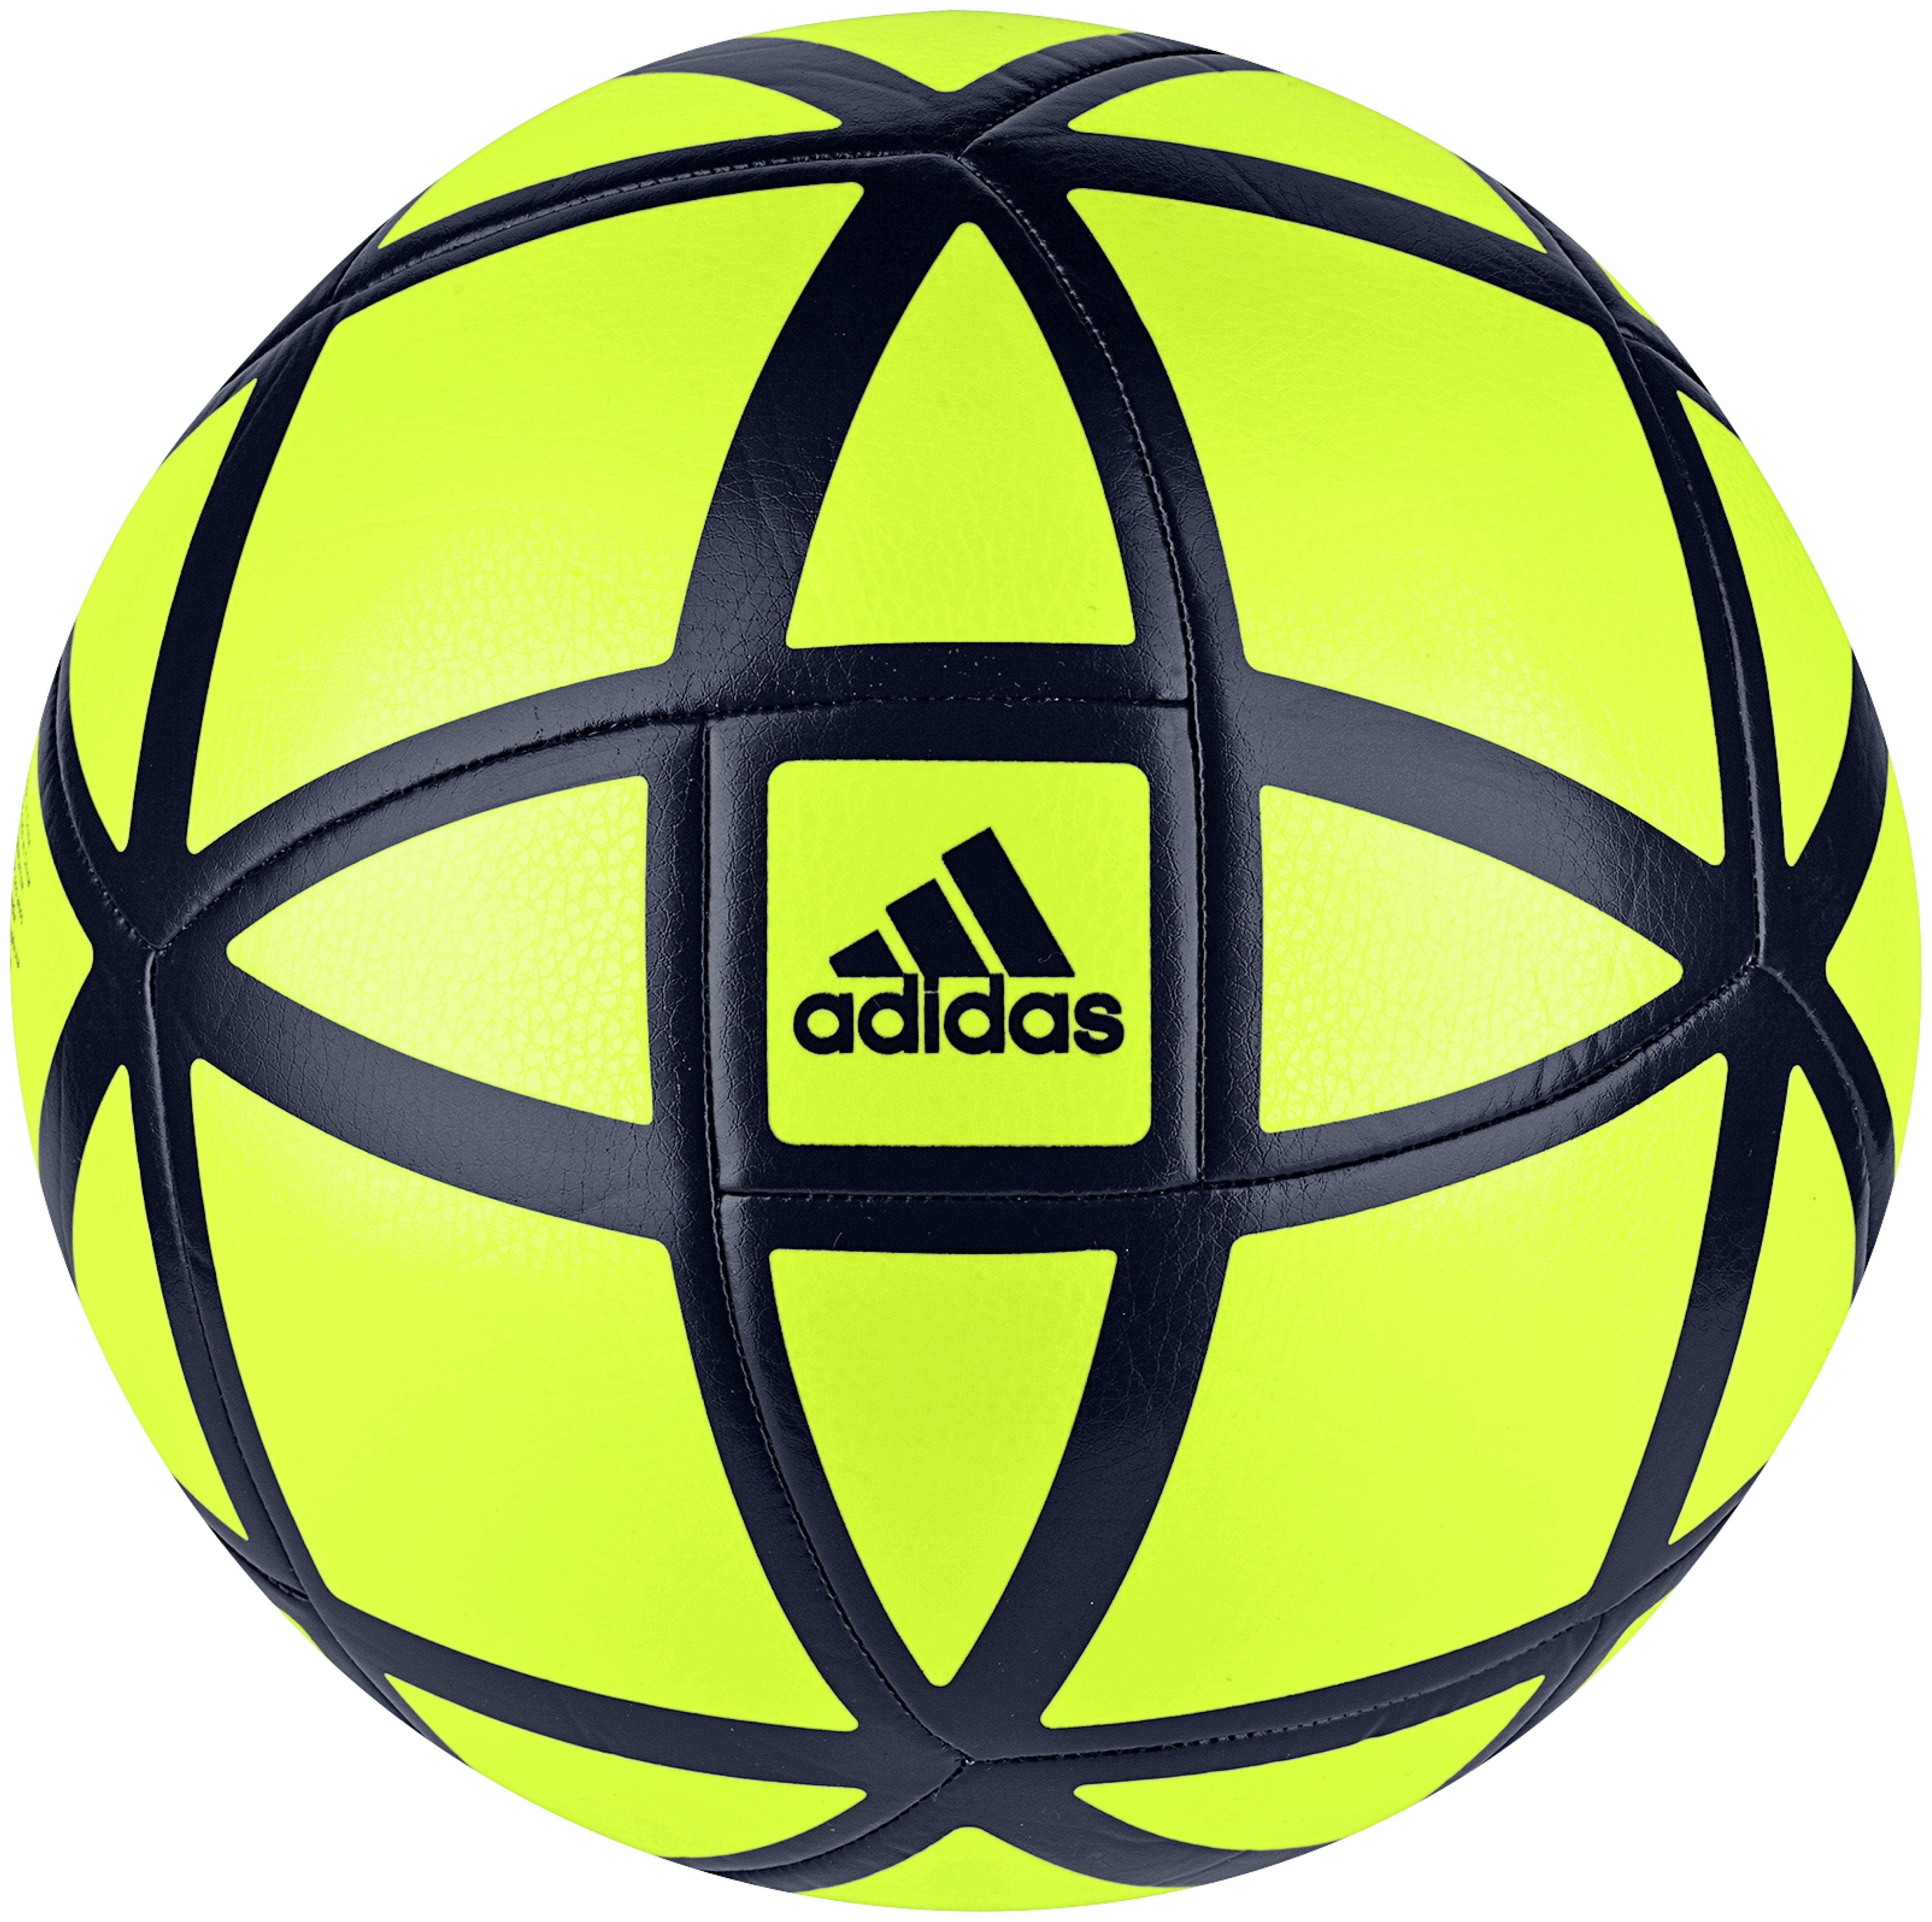 Adidas Yellow Glider Football